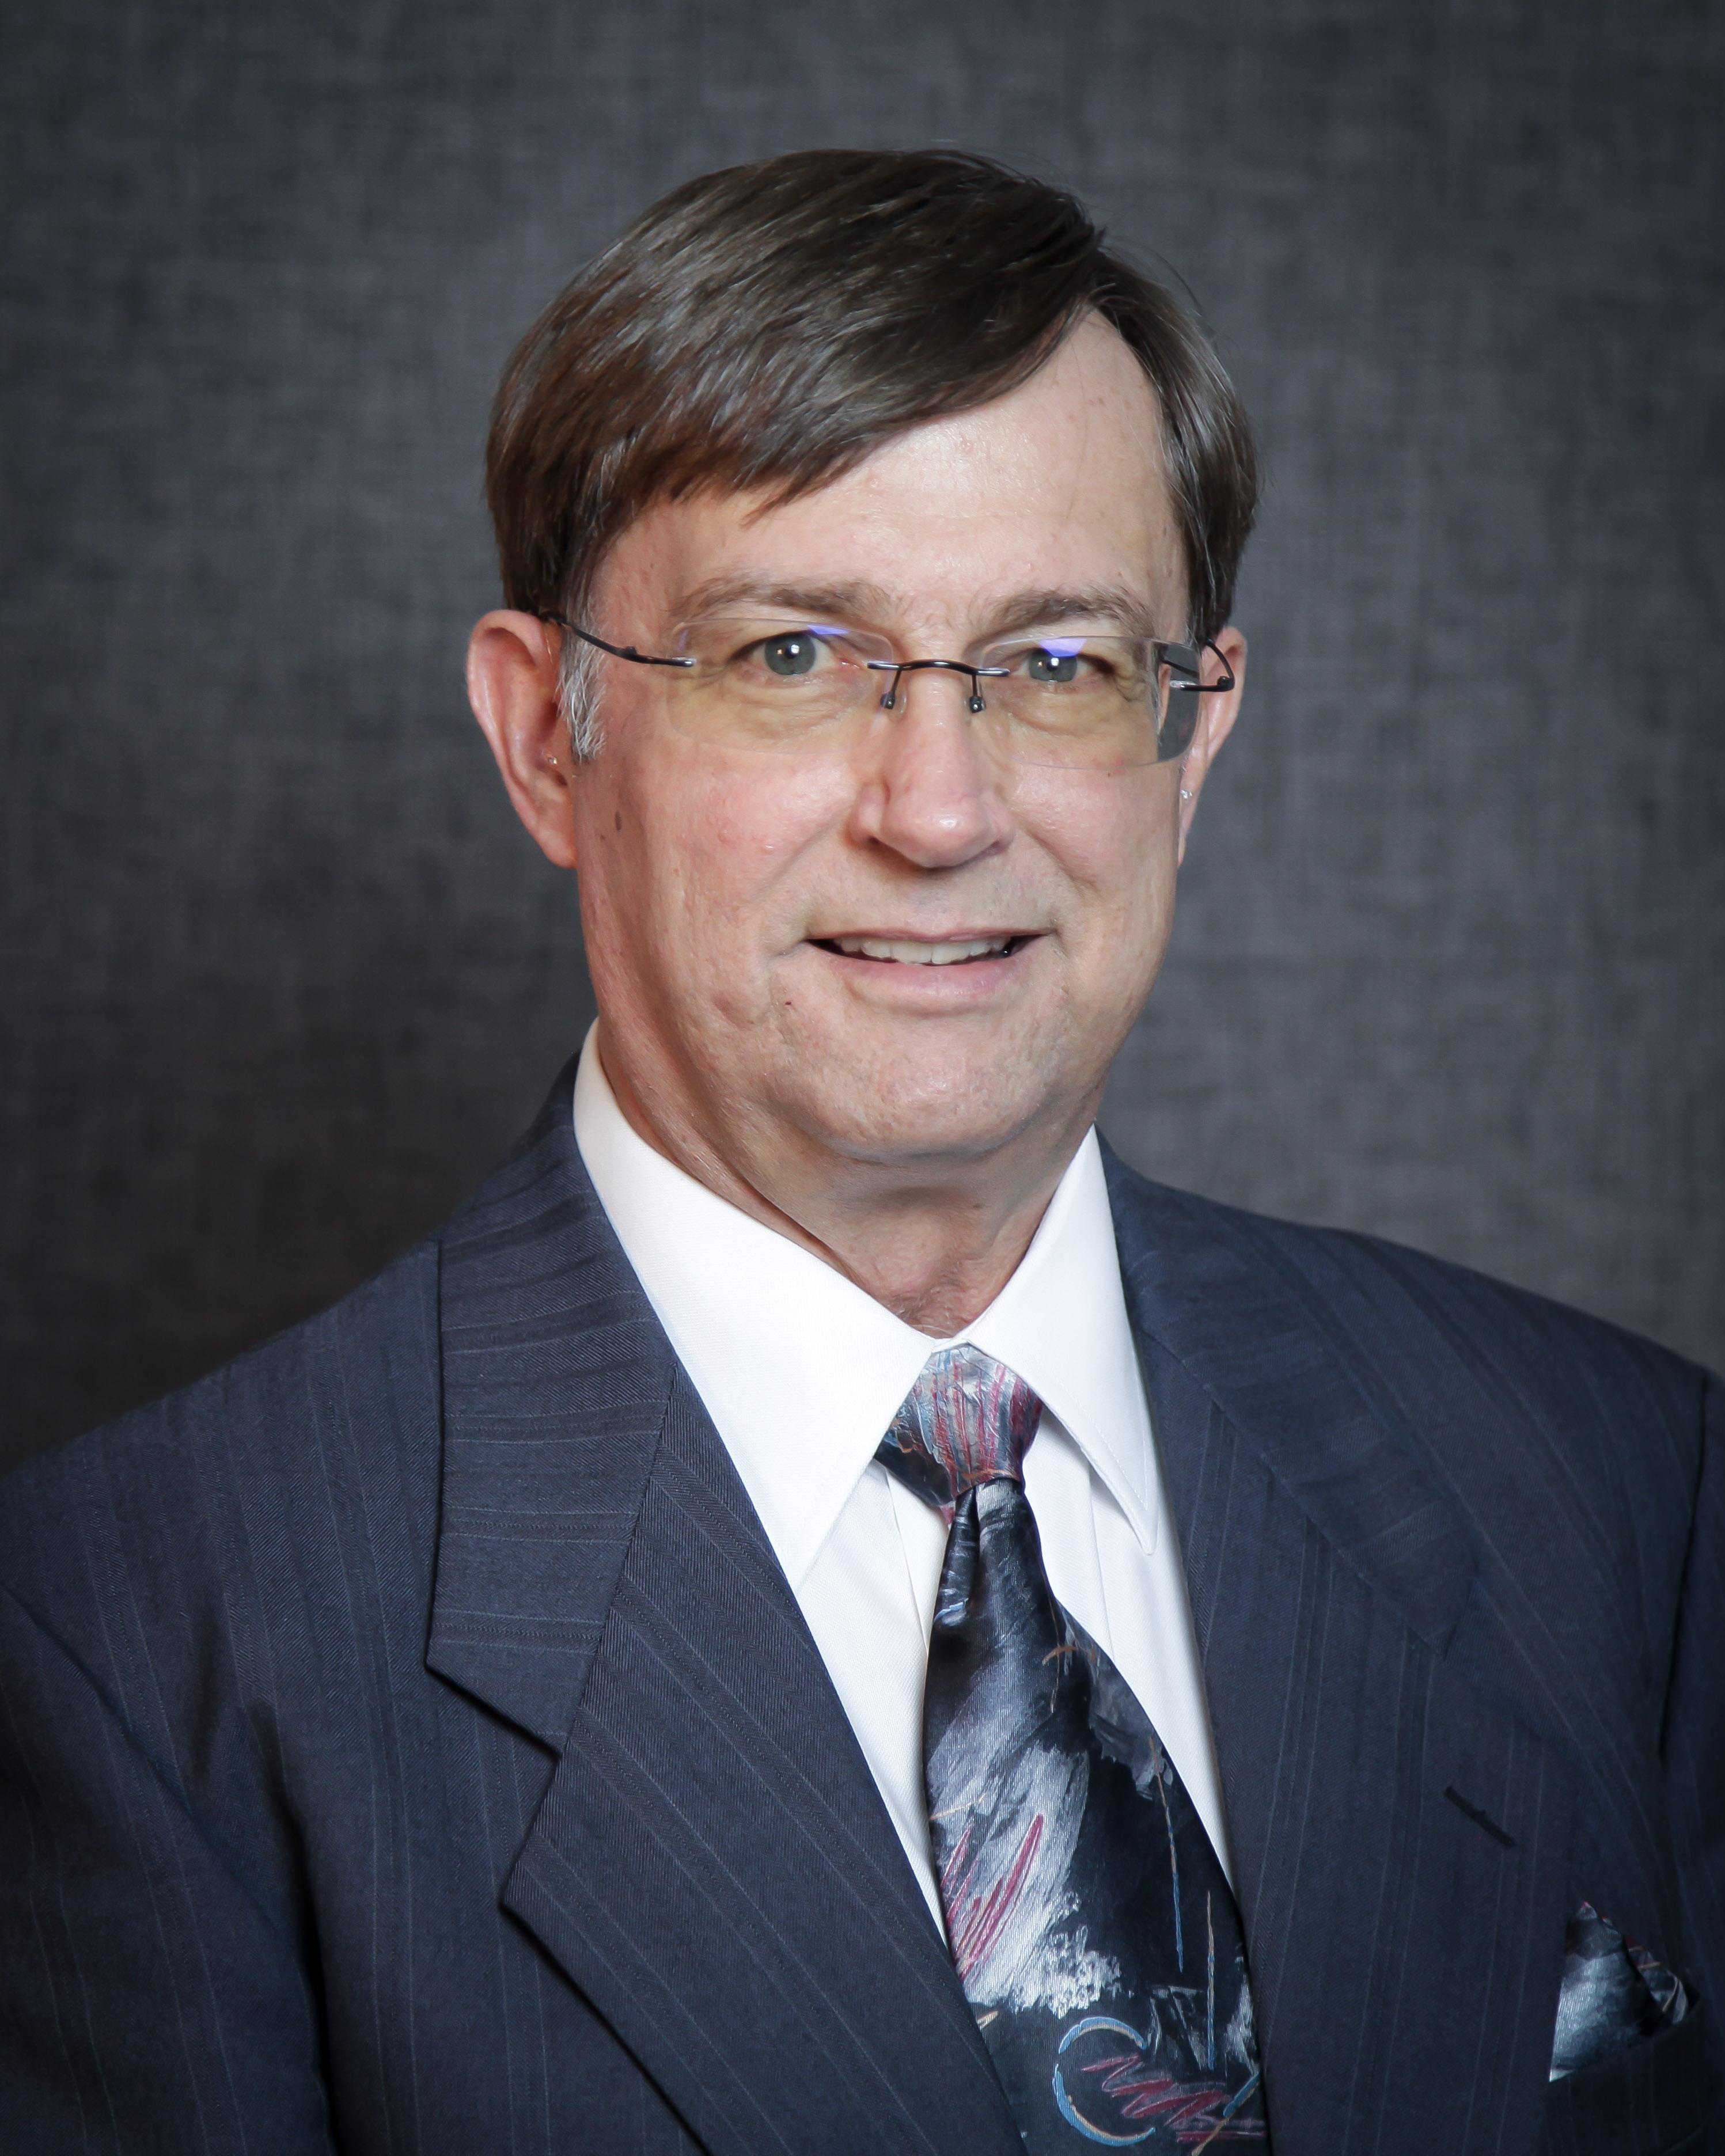 Dr. Bradly Bundrant